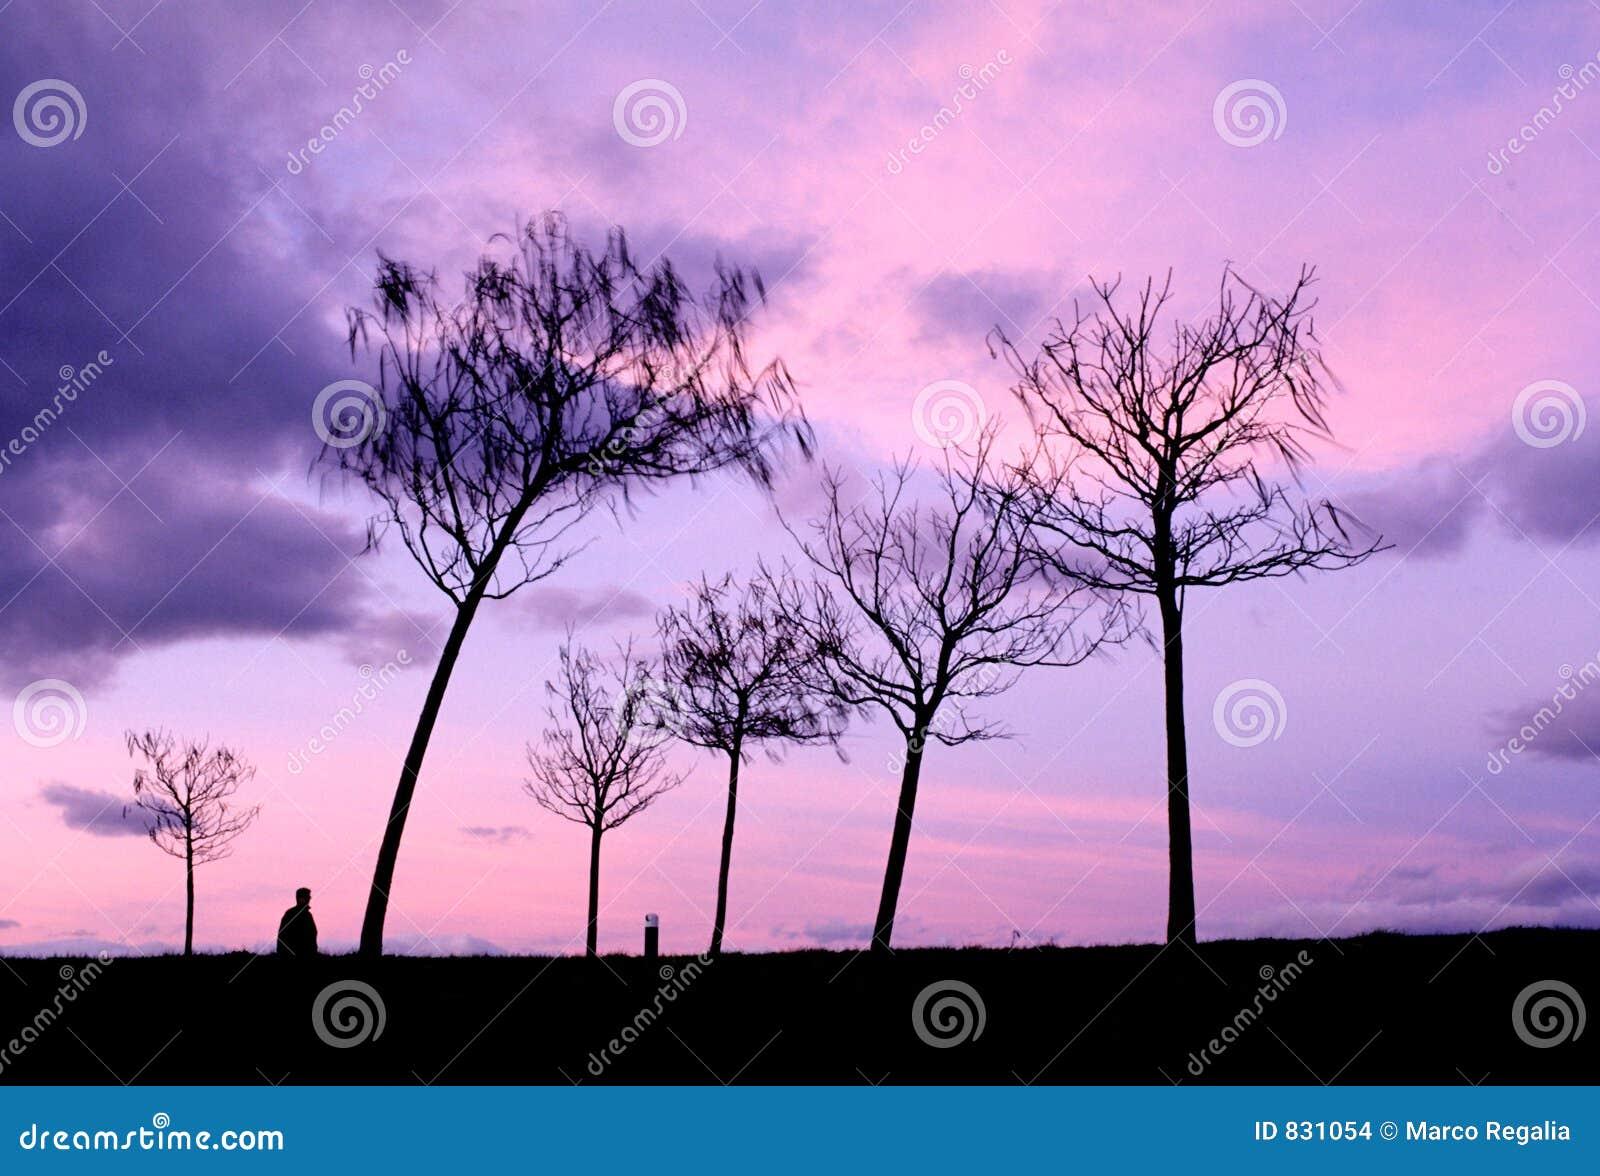 Black trees silhouette